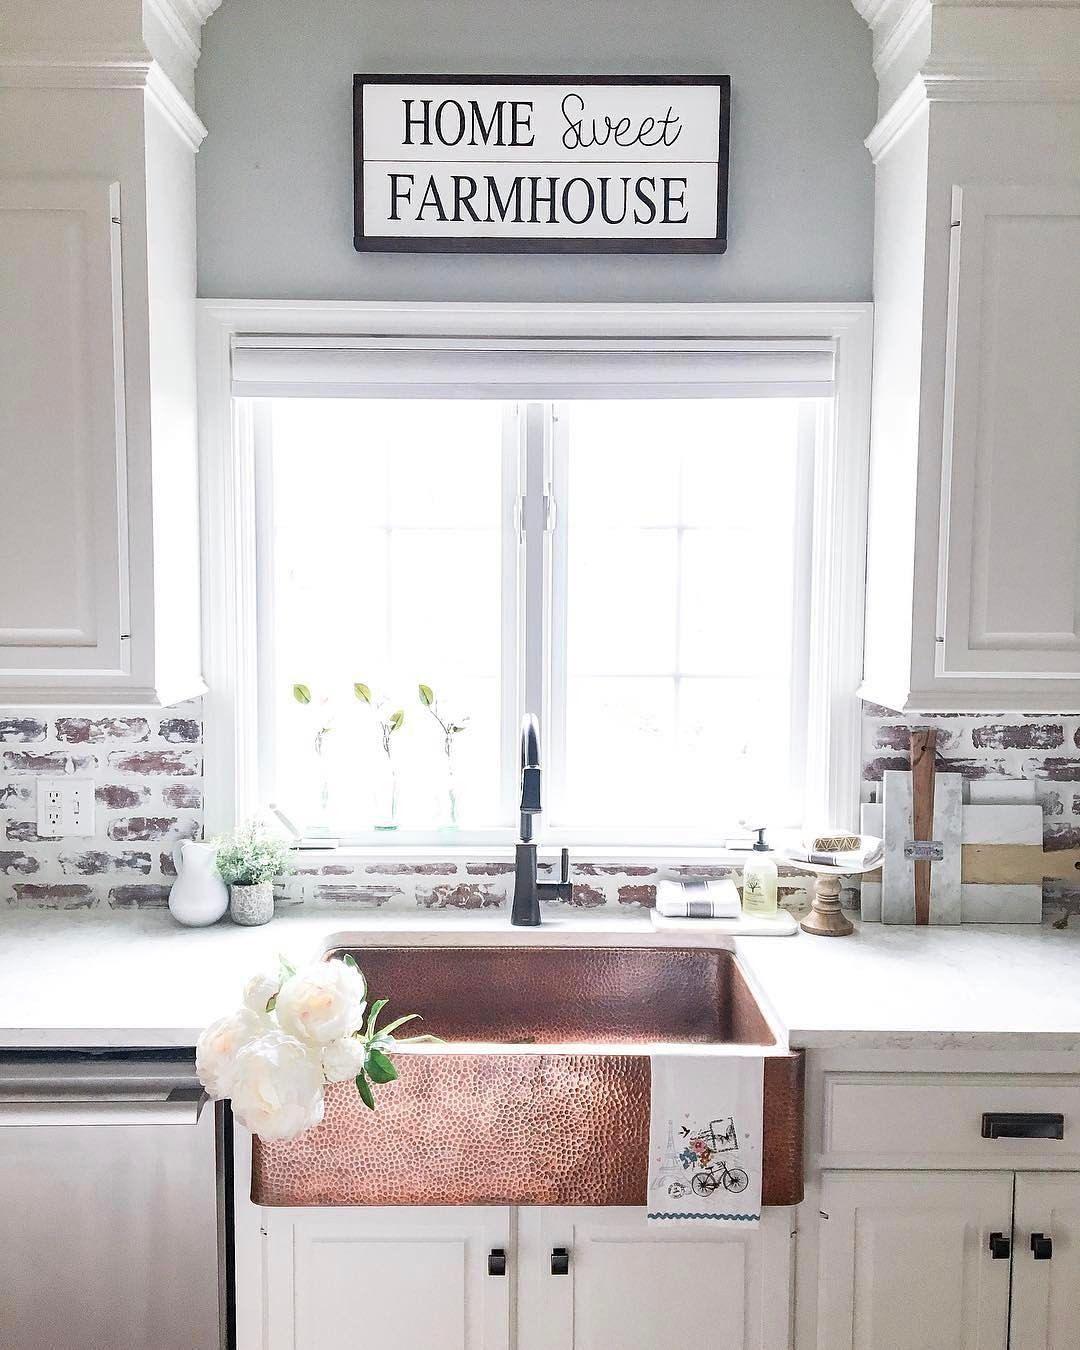 11.4k Likes, 166 Comments - Better Homes & Gardens ...